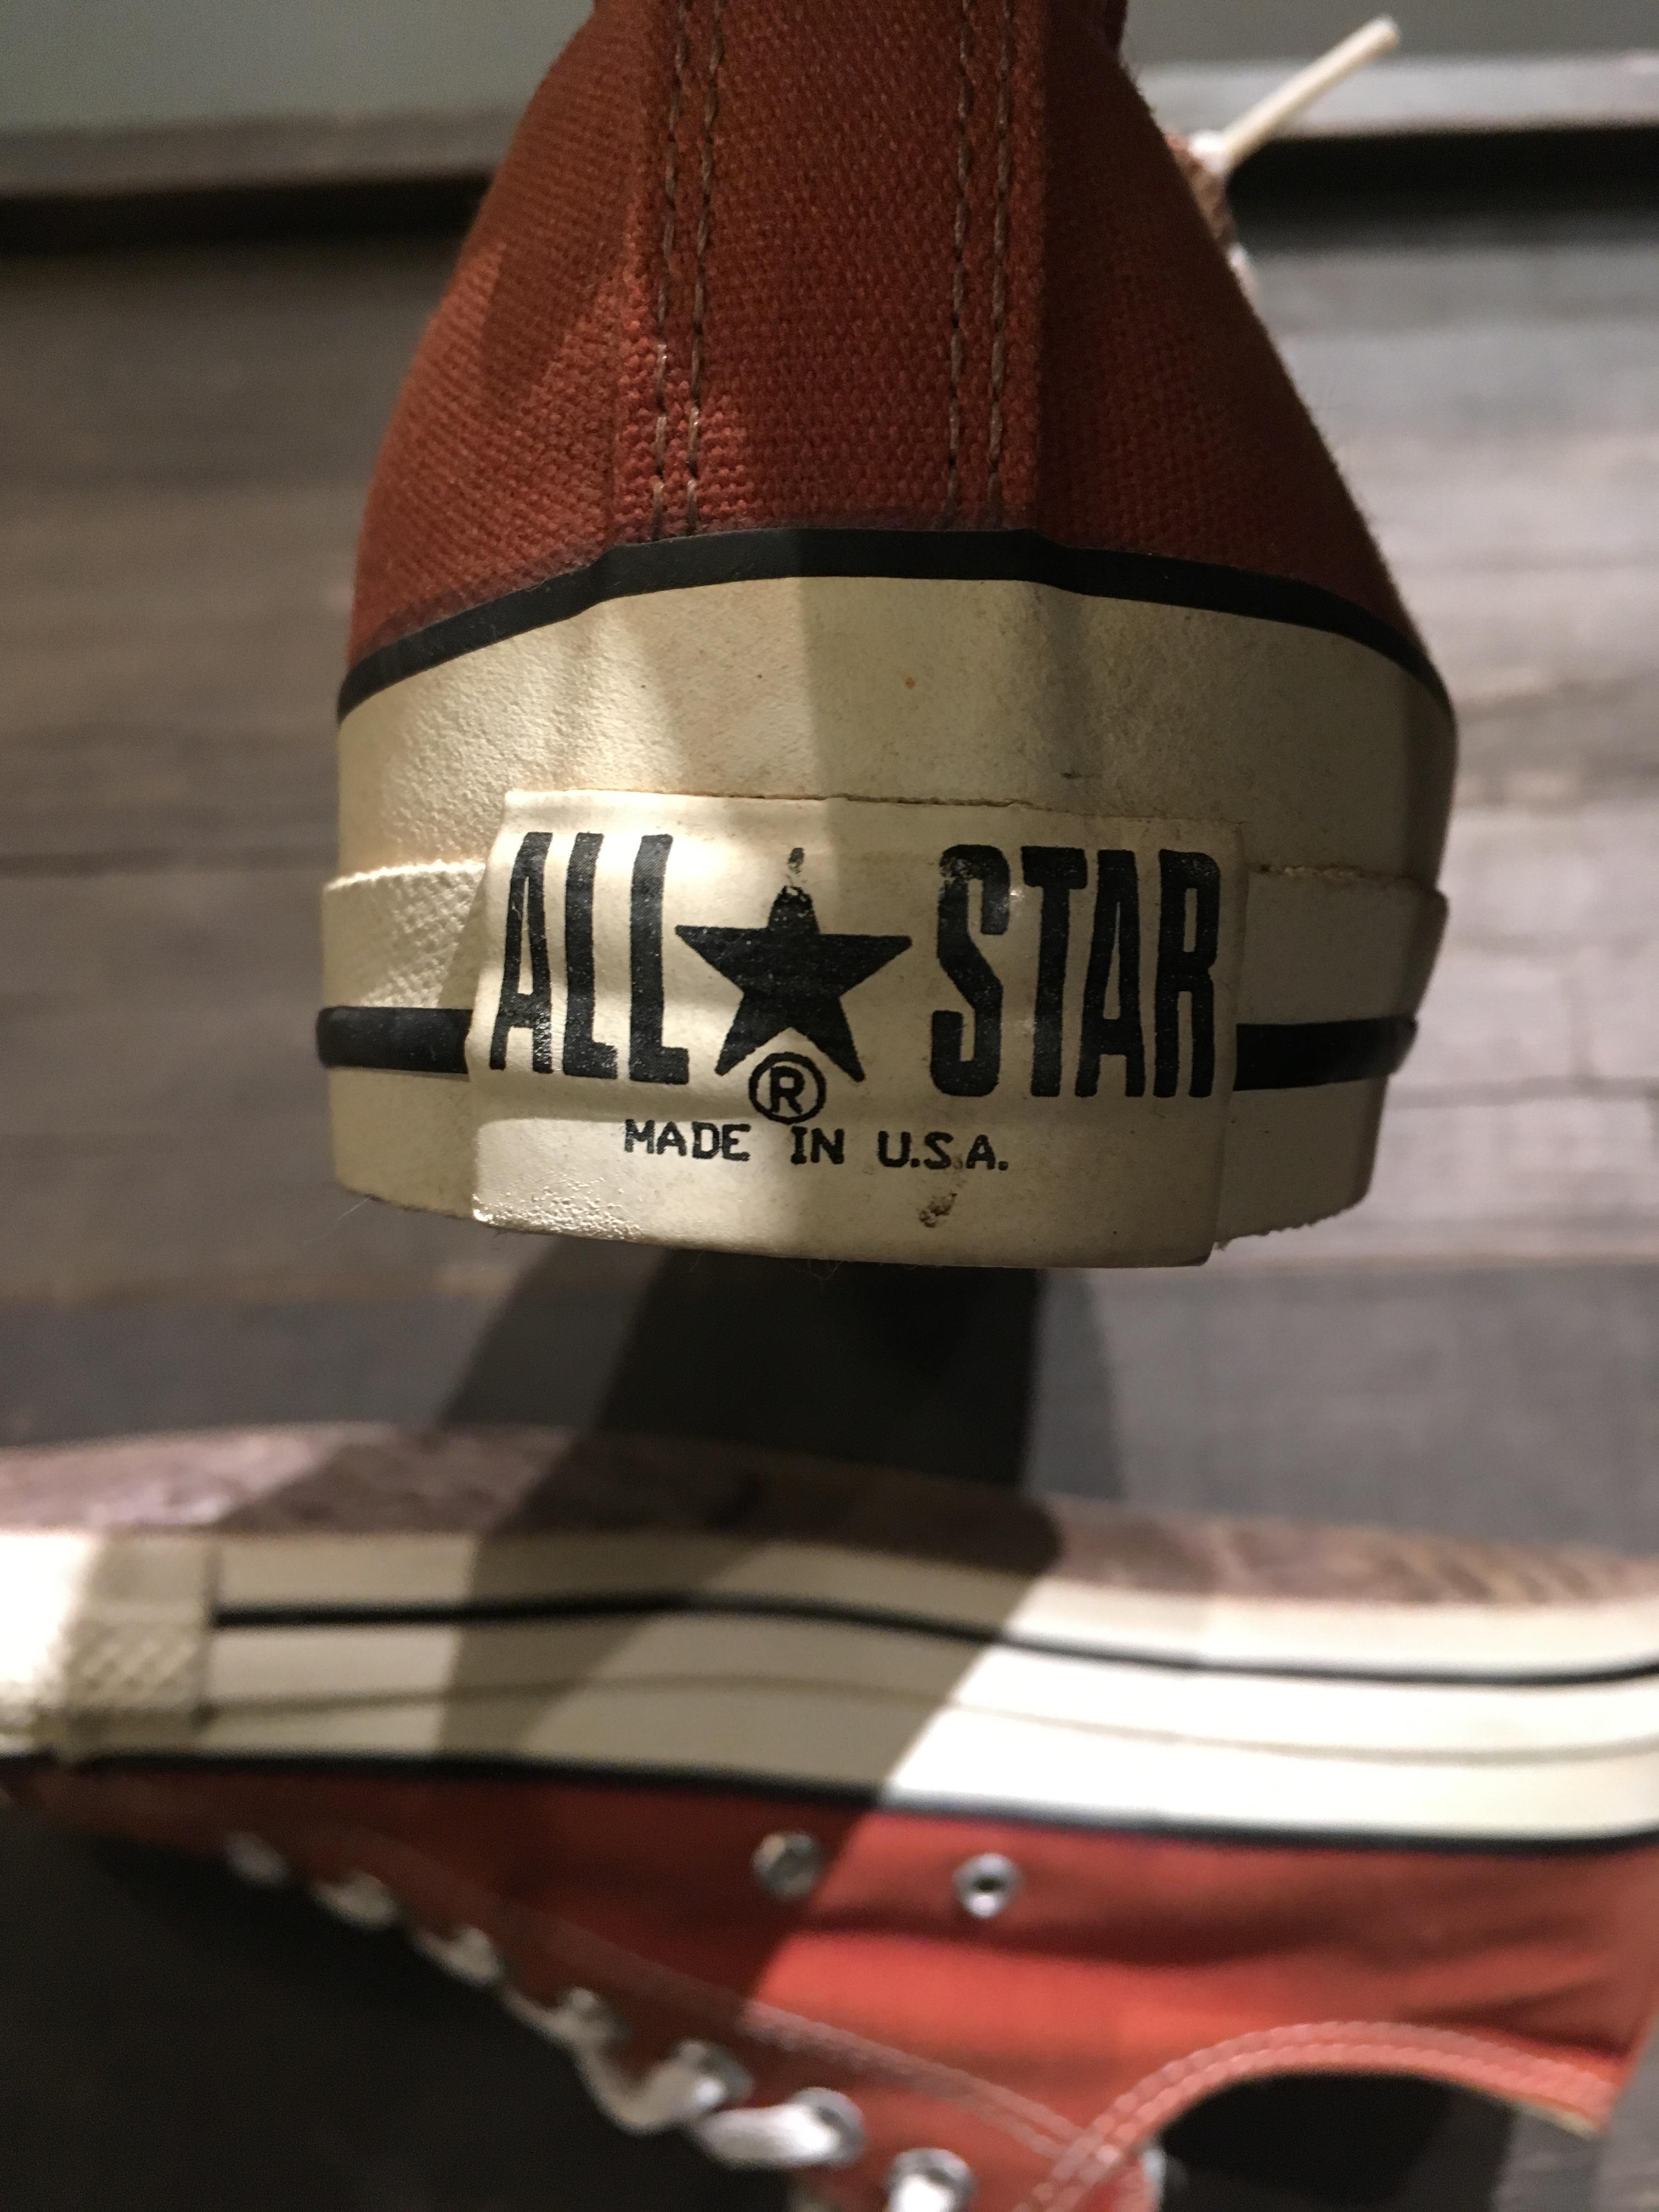 CONVERSE ALL STAR U.S.A ヴィンテージスニーカー